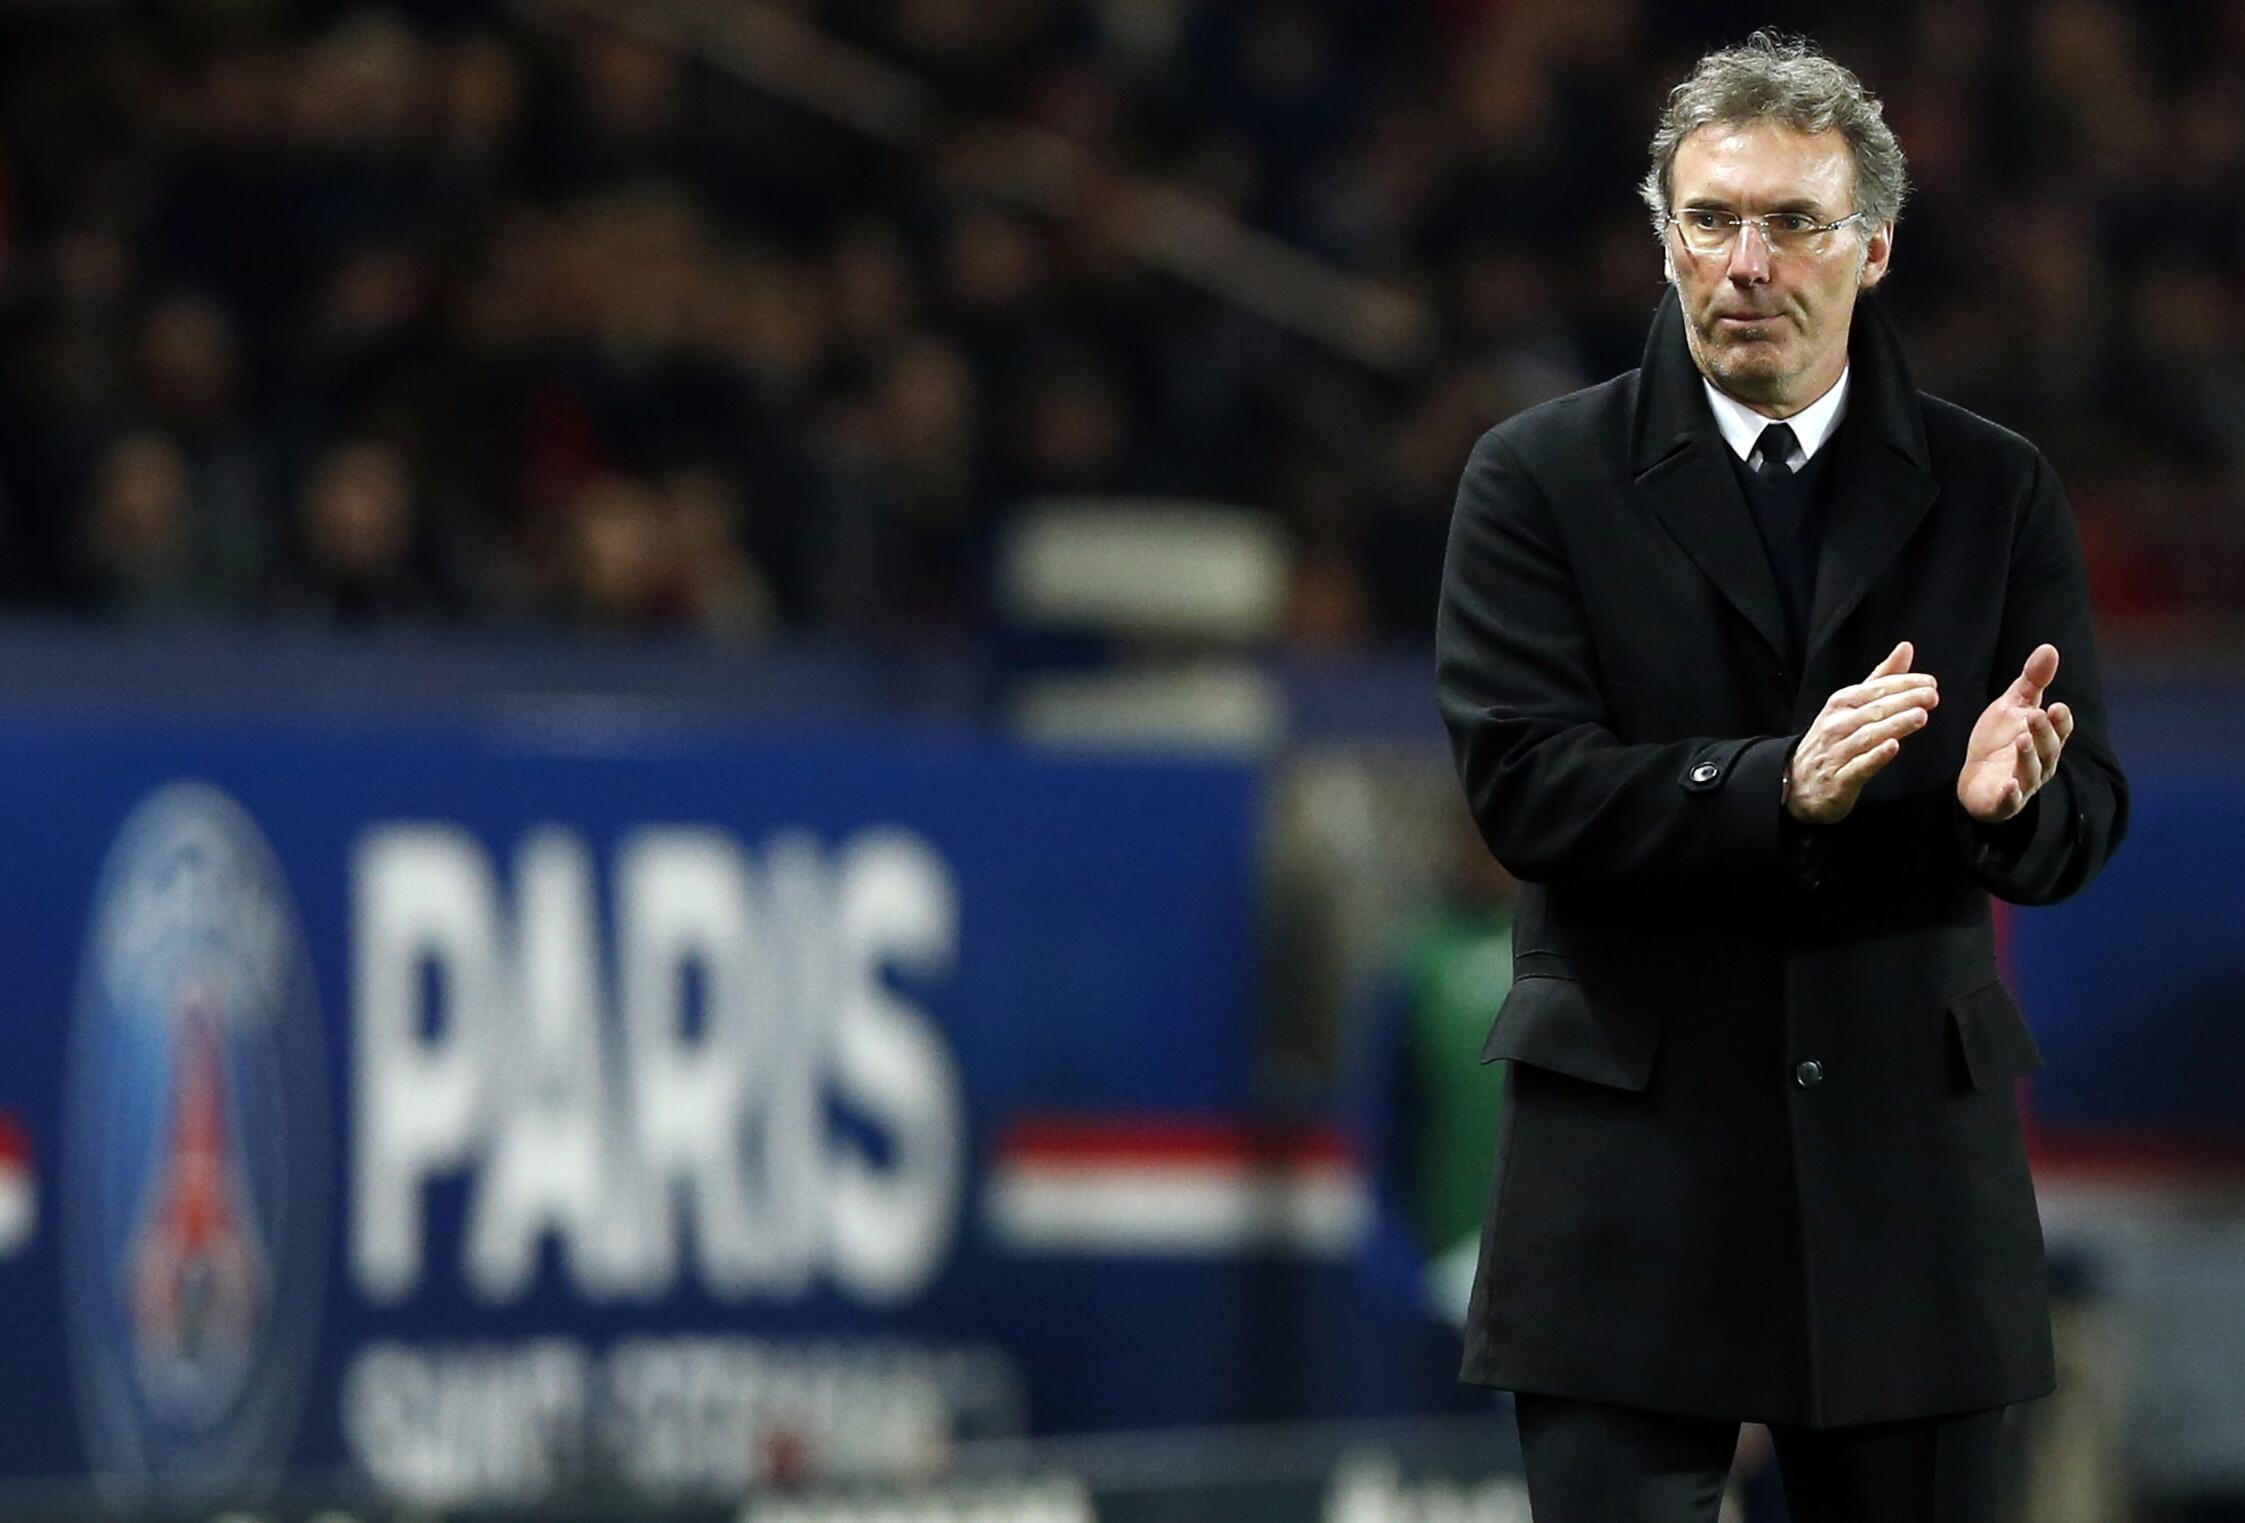 O técnico do Paris Saint-Germain, Laurent Blanc, em foto de arquivo.